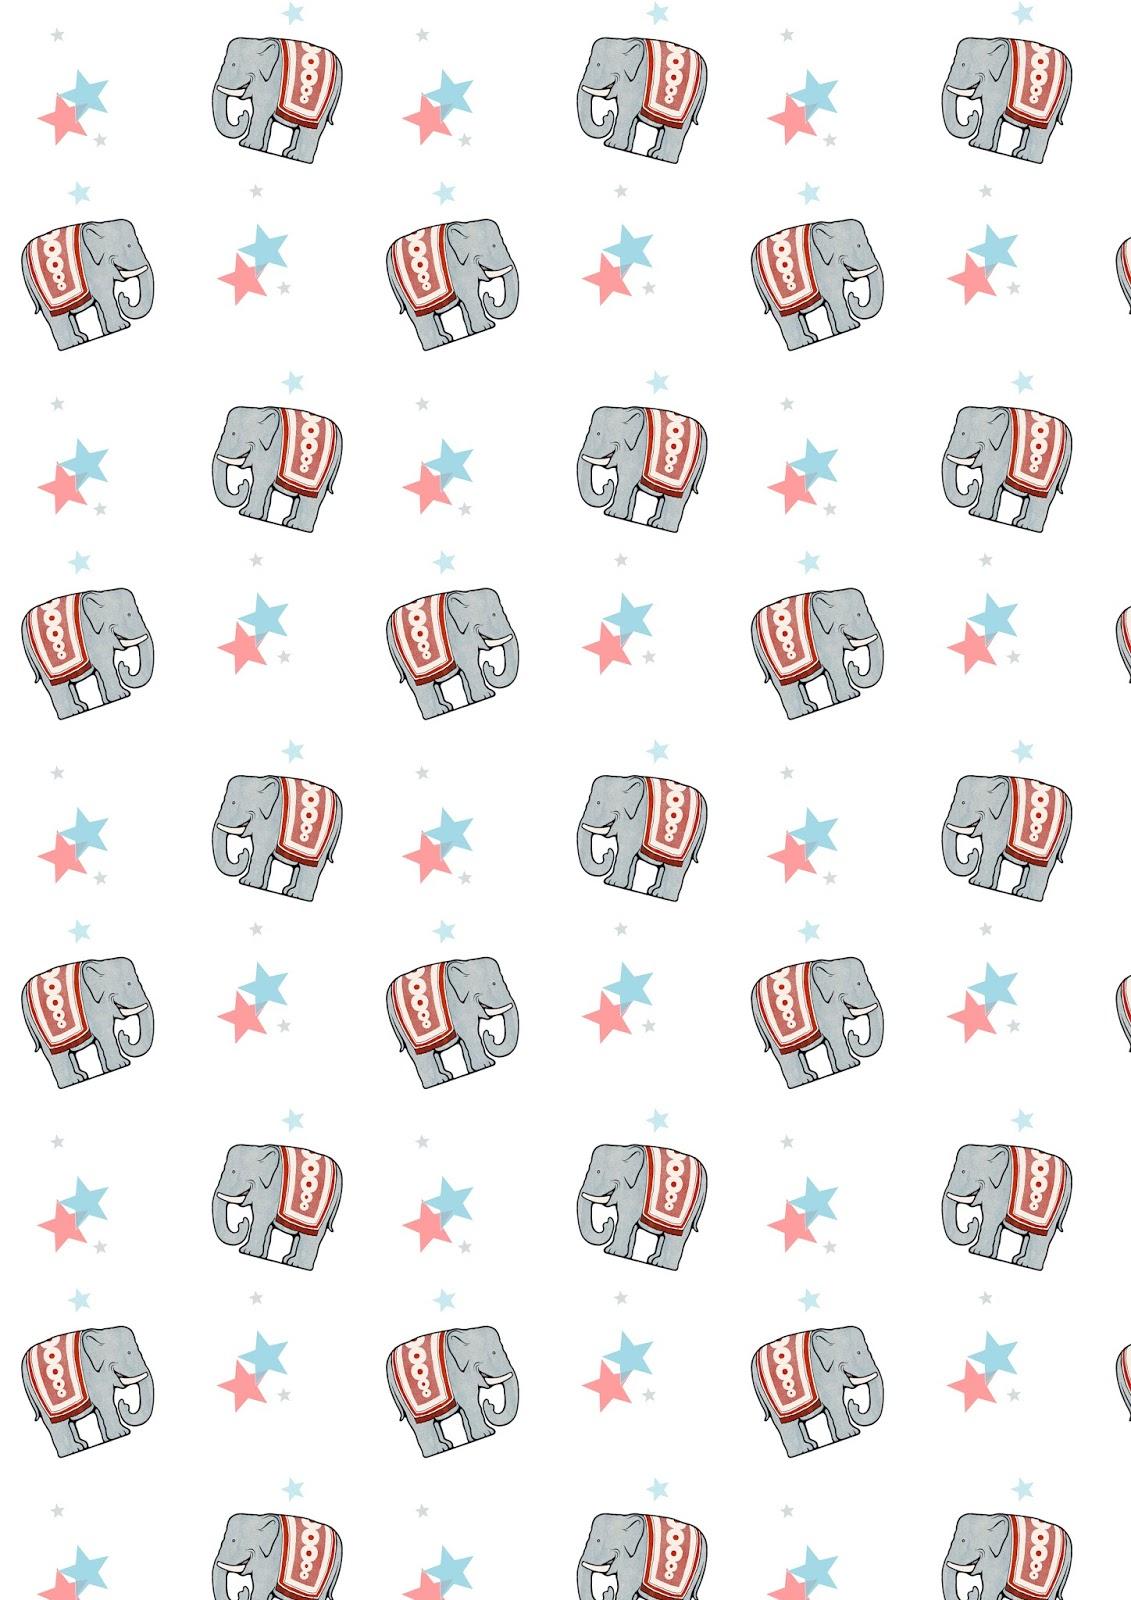 free printable childrenu0026#39;s birthday pattern paper (DIN A4)